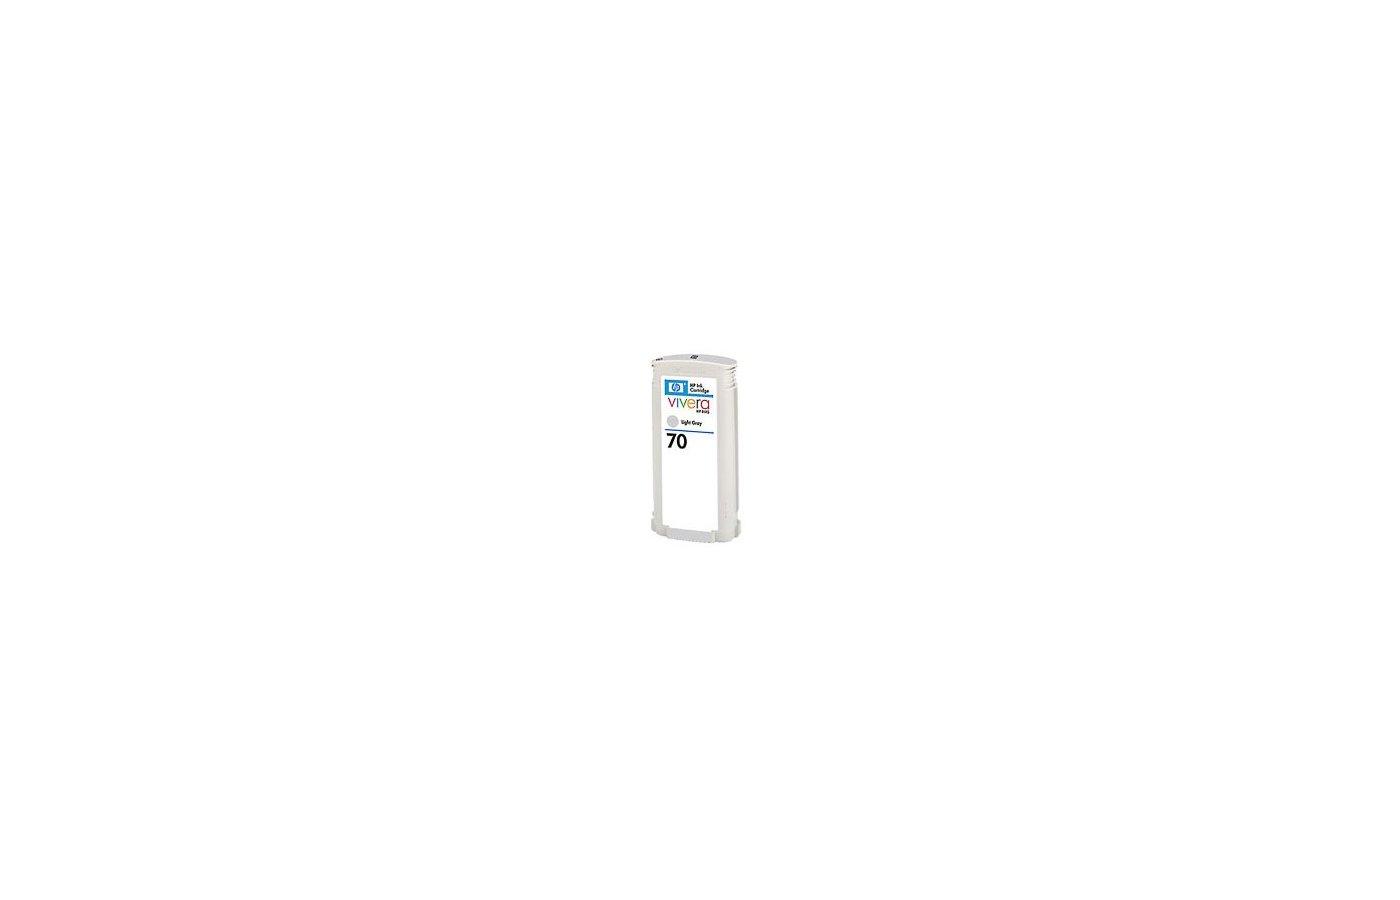 Картридж струйный HP 70 C9451A Light grey для DJ Z2100/Z3100 (130 мл)